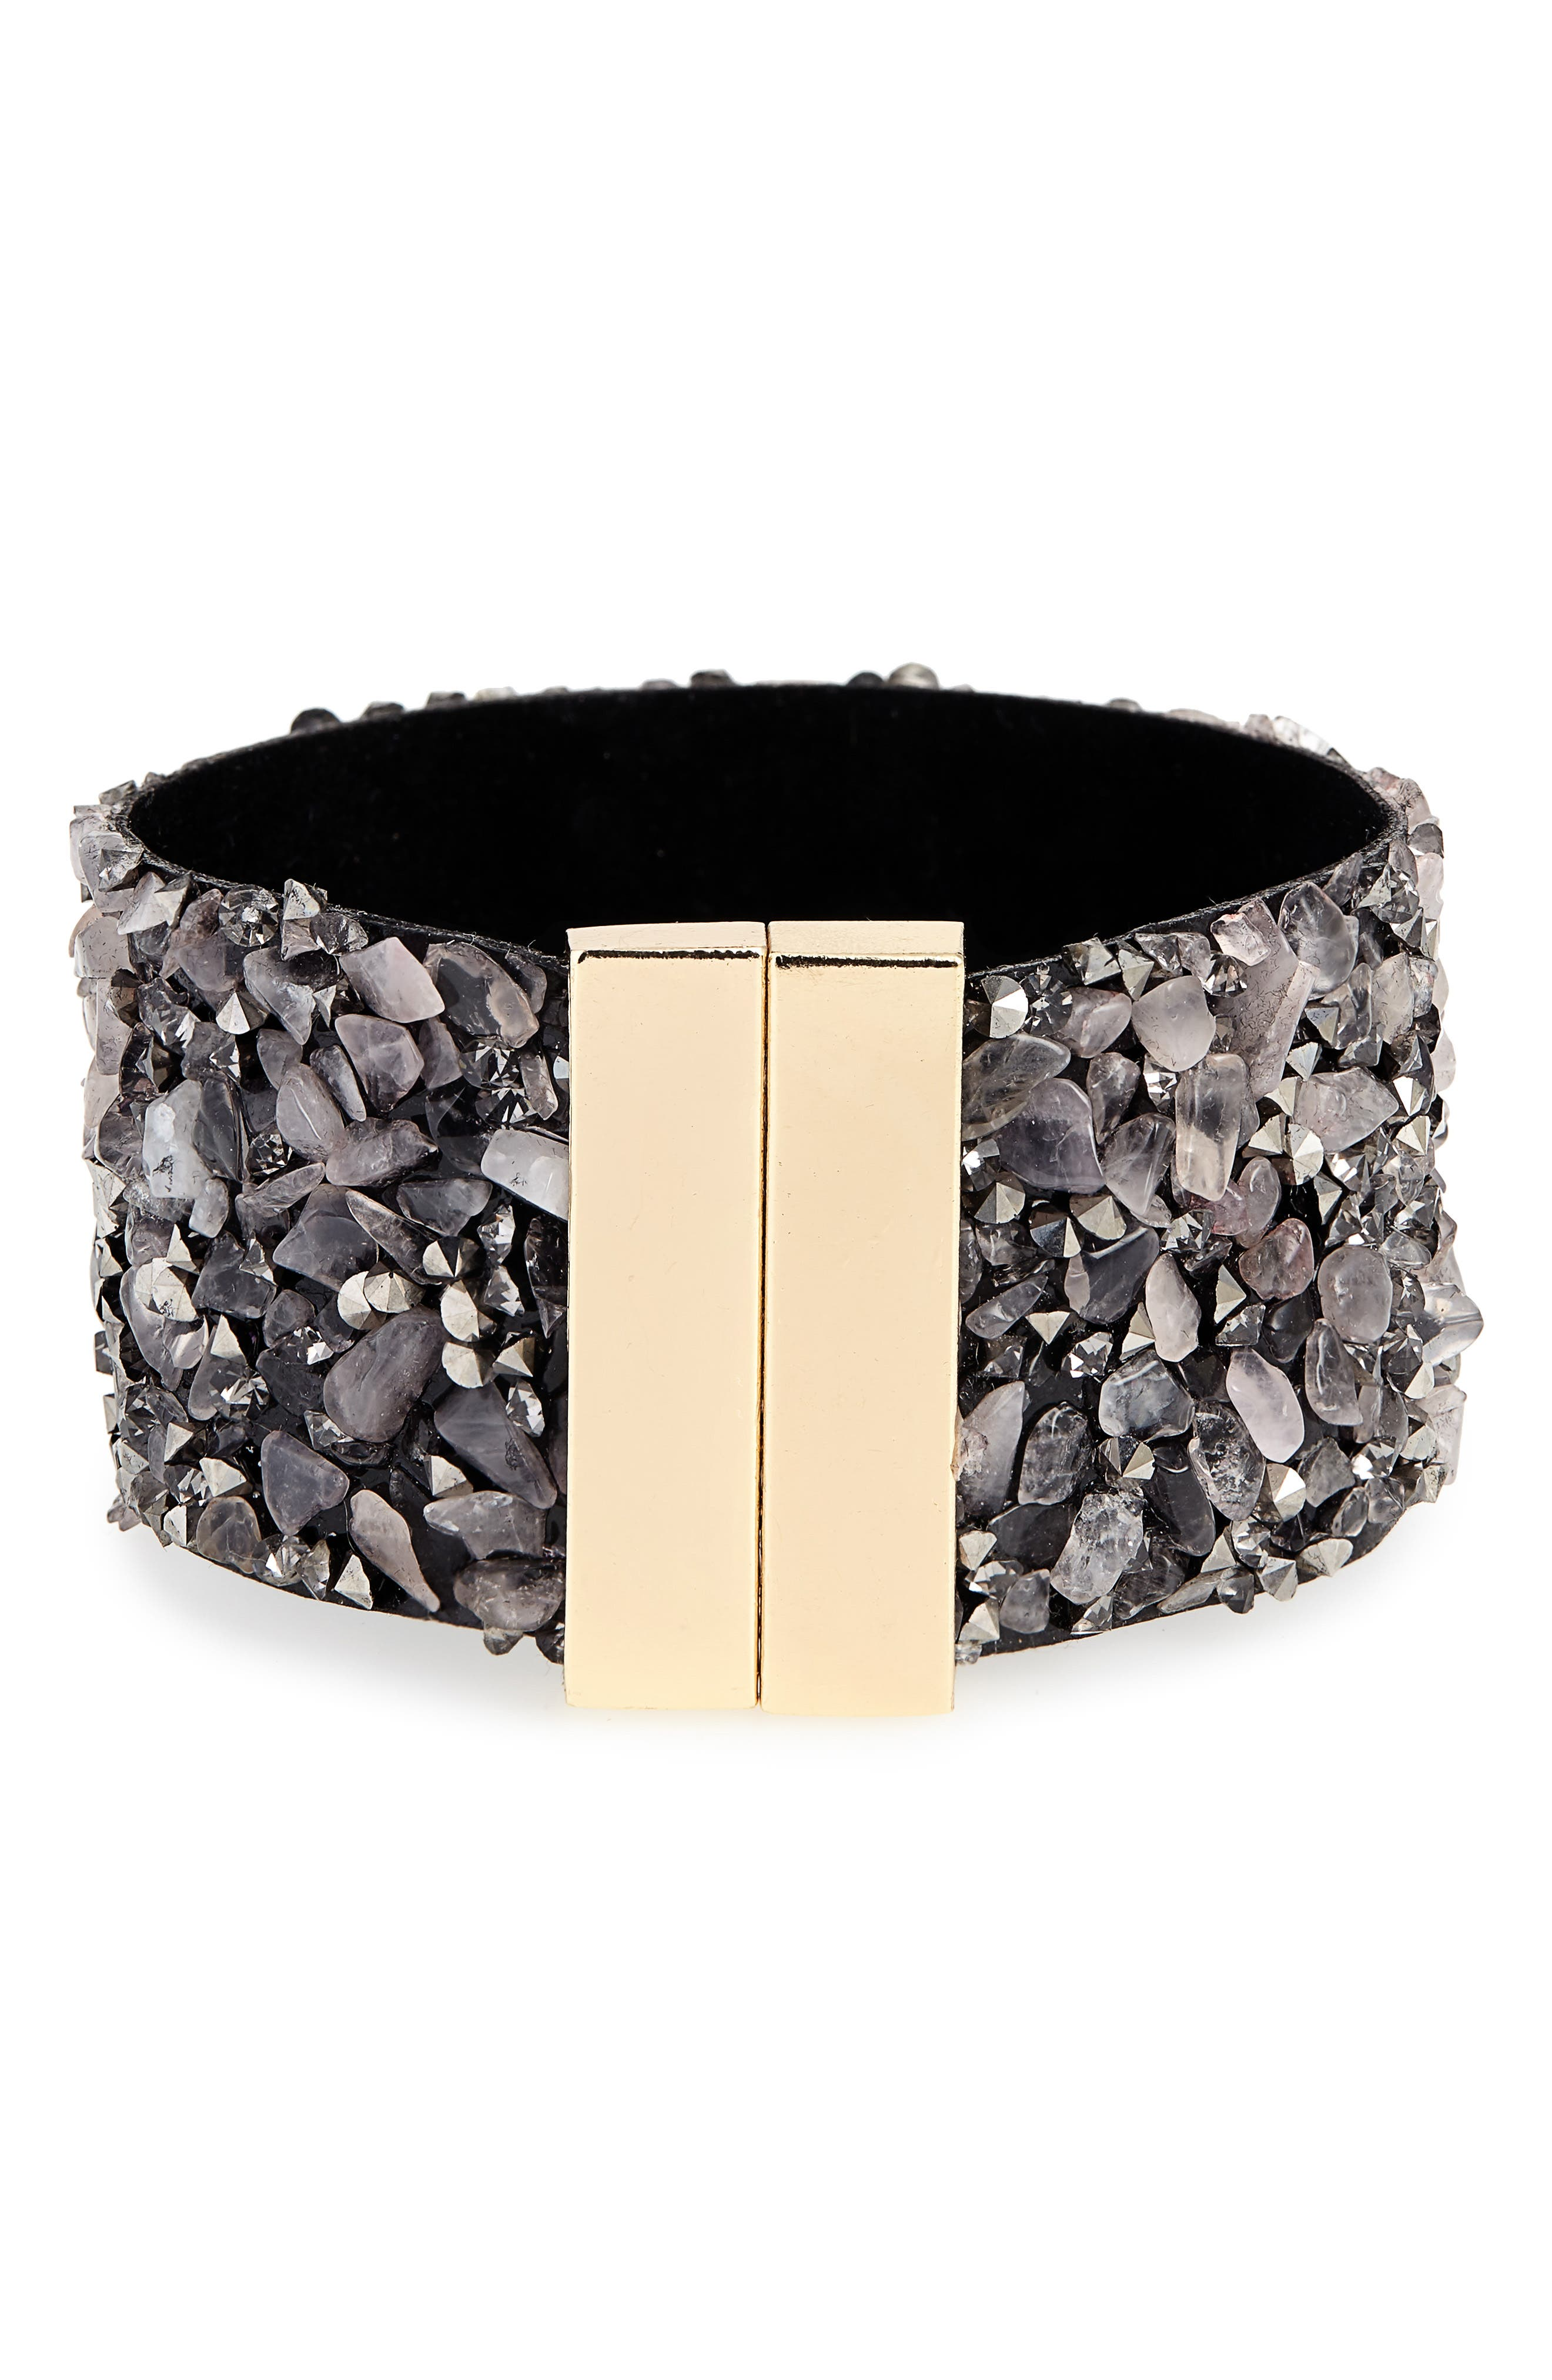 PANACEA Stone & Leather Cuff Bracelet in Grey